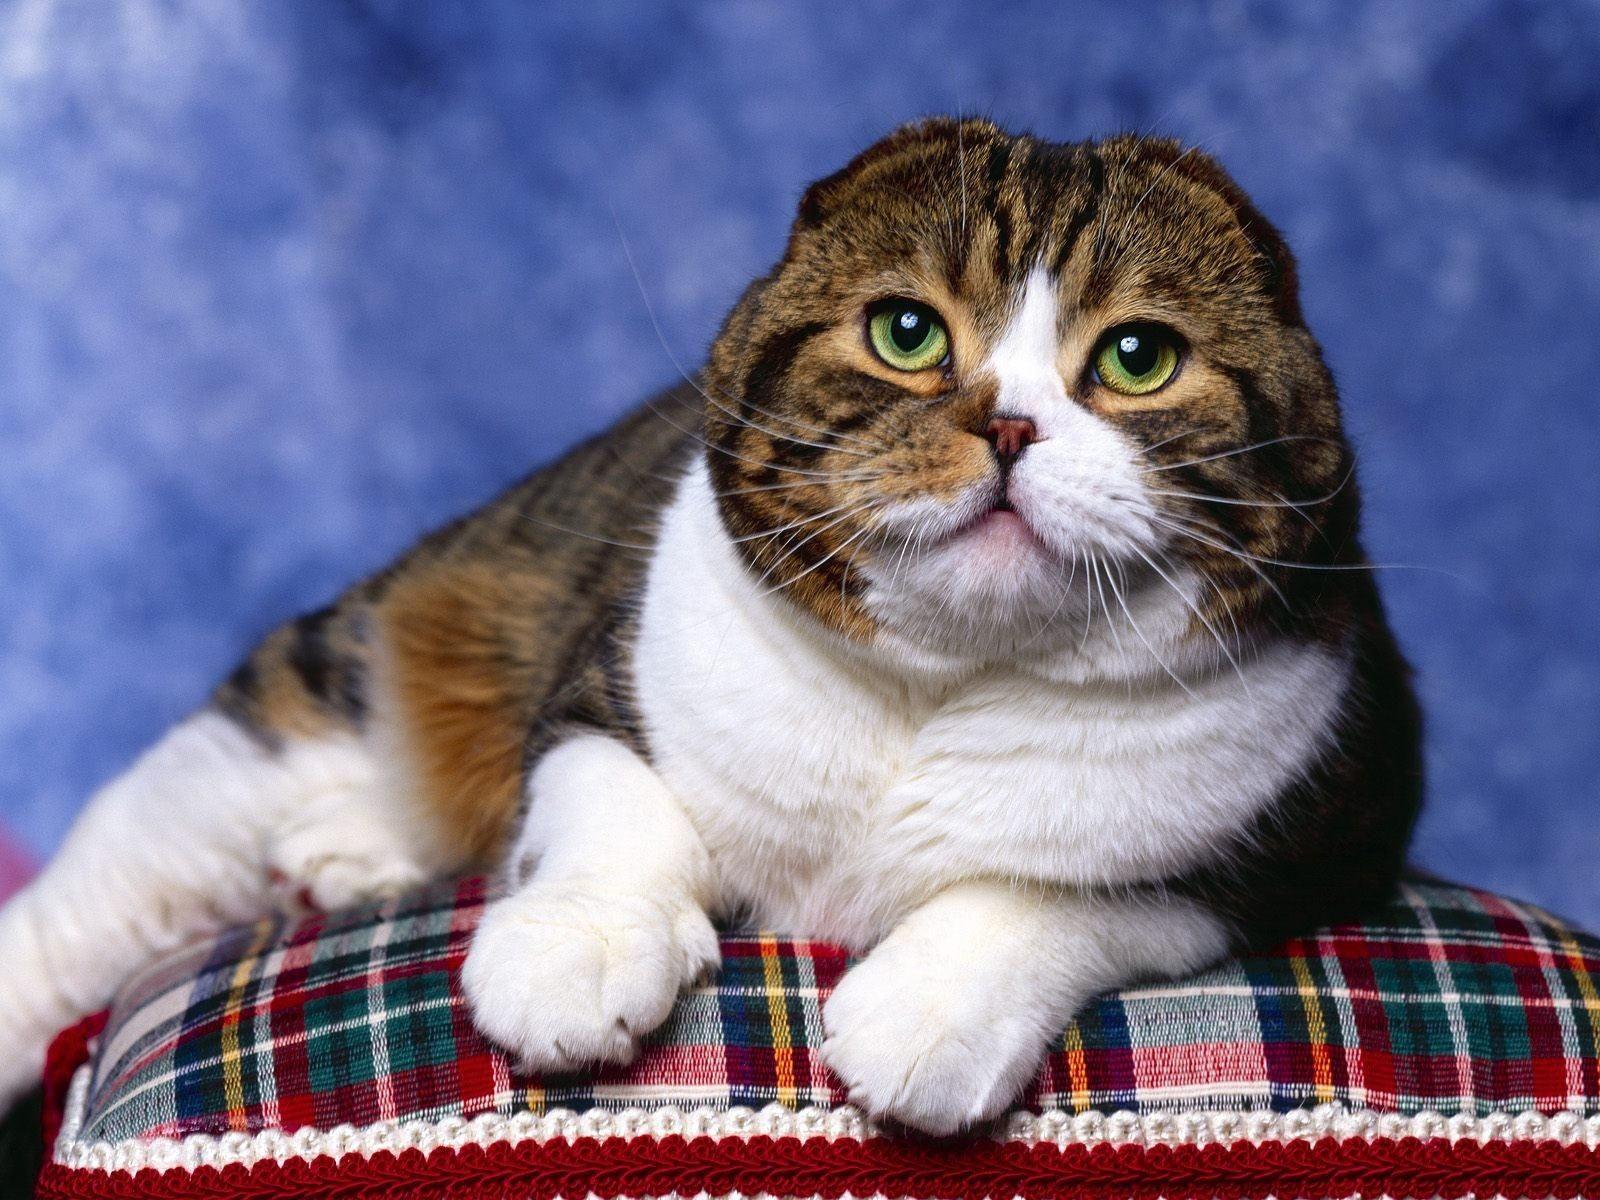 Free Scottish Fold Kittens Scottish Fold Kitten Free Wallpaper In Free Pet Category Cat Cat Scottish Fold Cat Breeds Scottish Fold